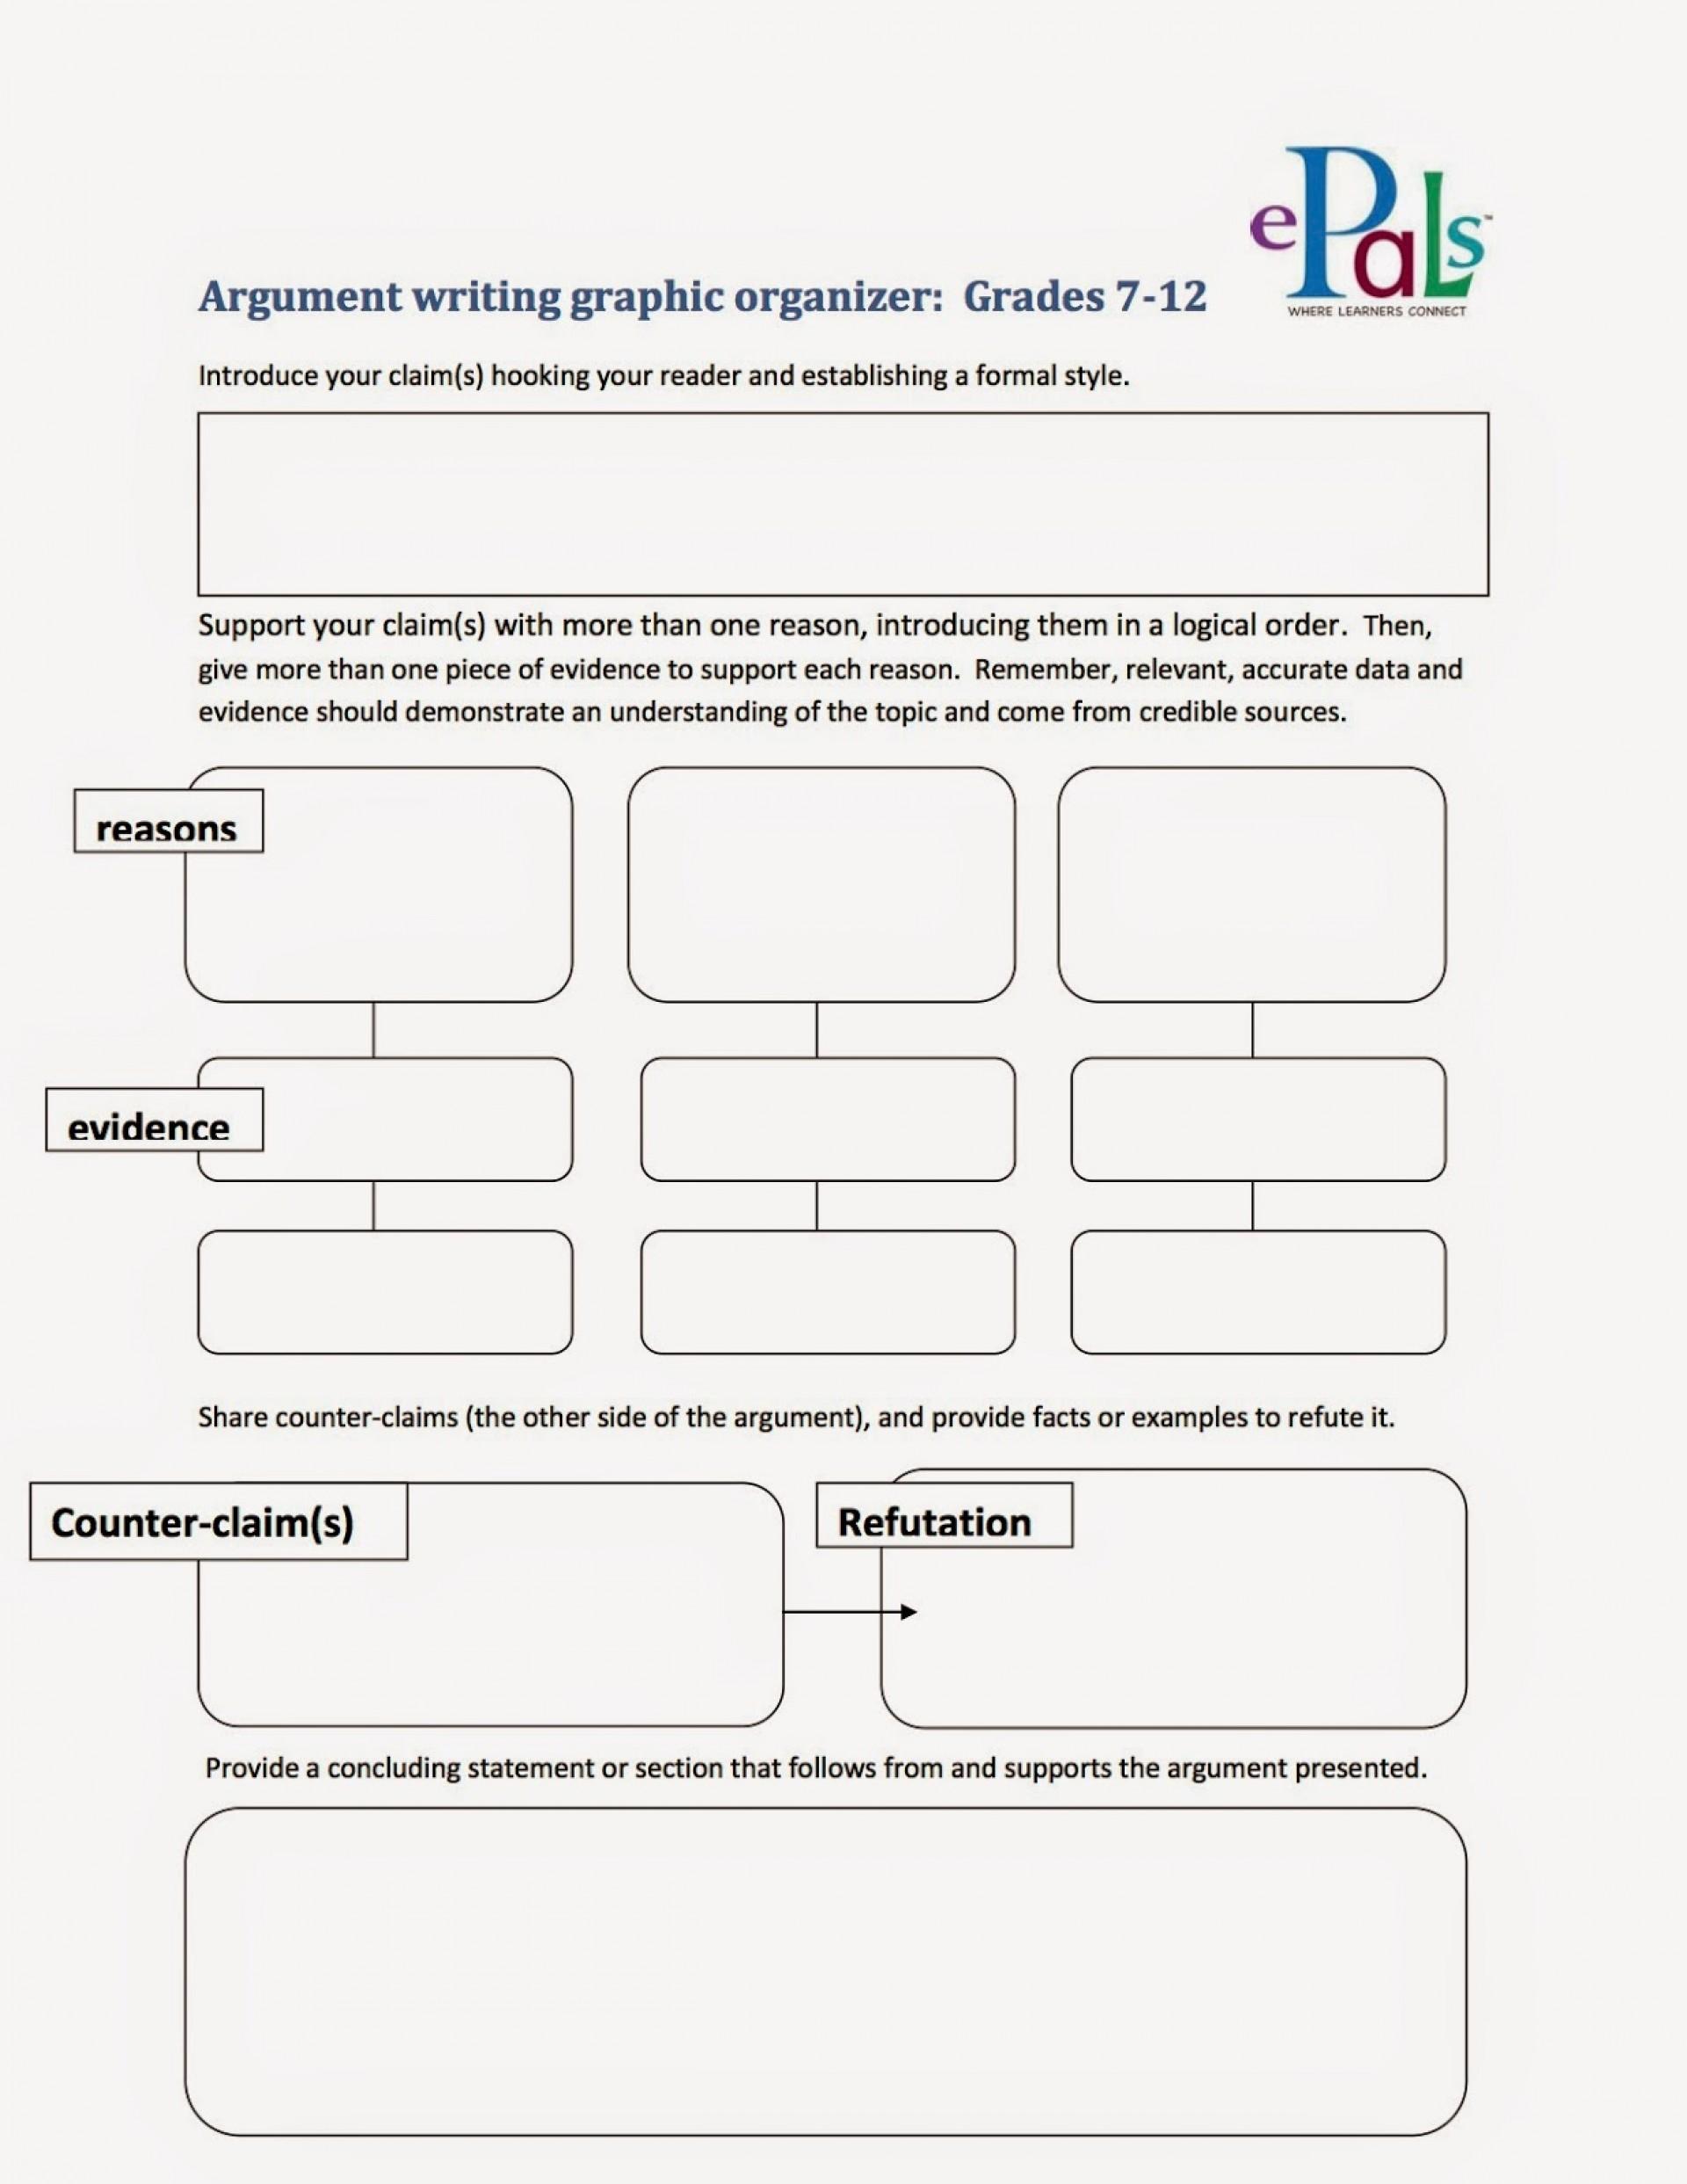 005 Argumentgraphicorganizer2bcopy Argument Essay Graphic Organizer Breathtaking Persuasive Examples Middle School Argumentative Pdf 1920